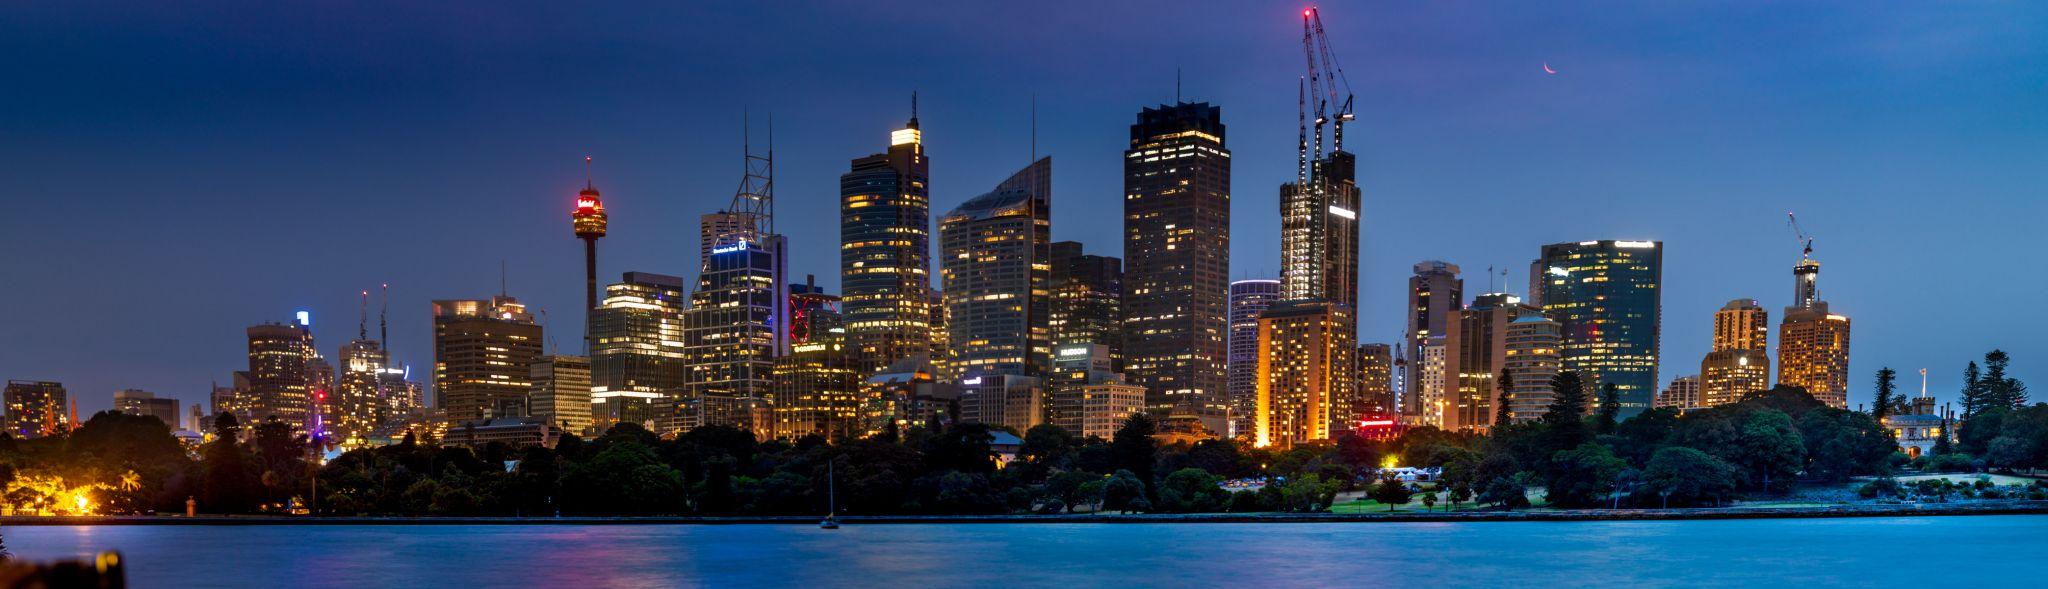 Sydney city at the blue hour., Australia